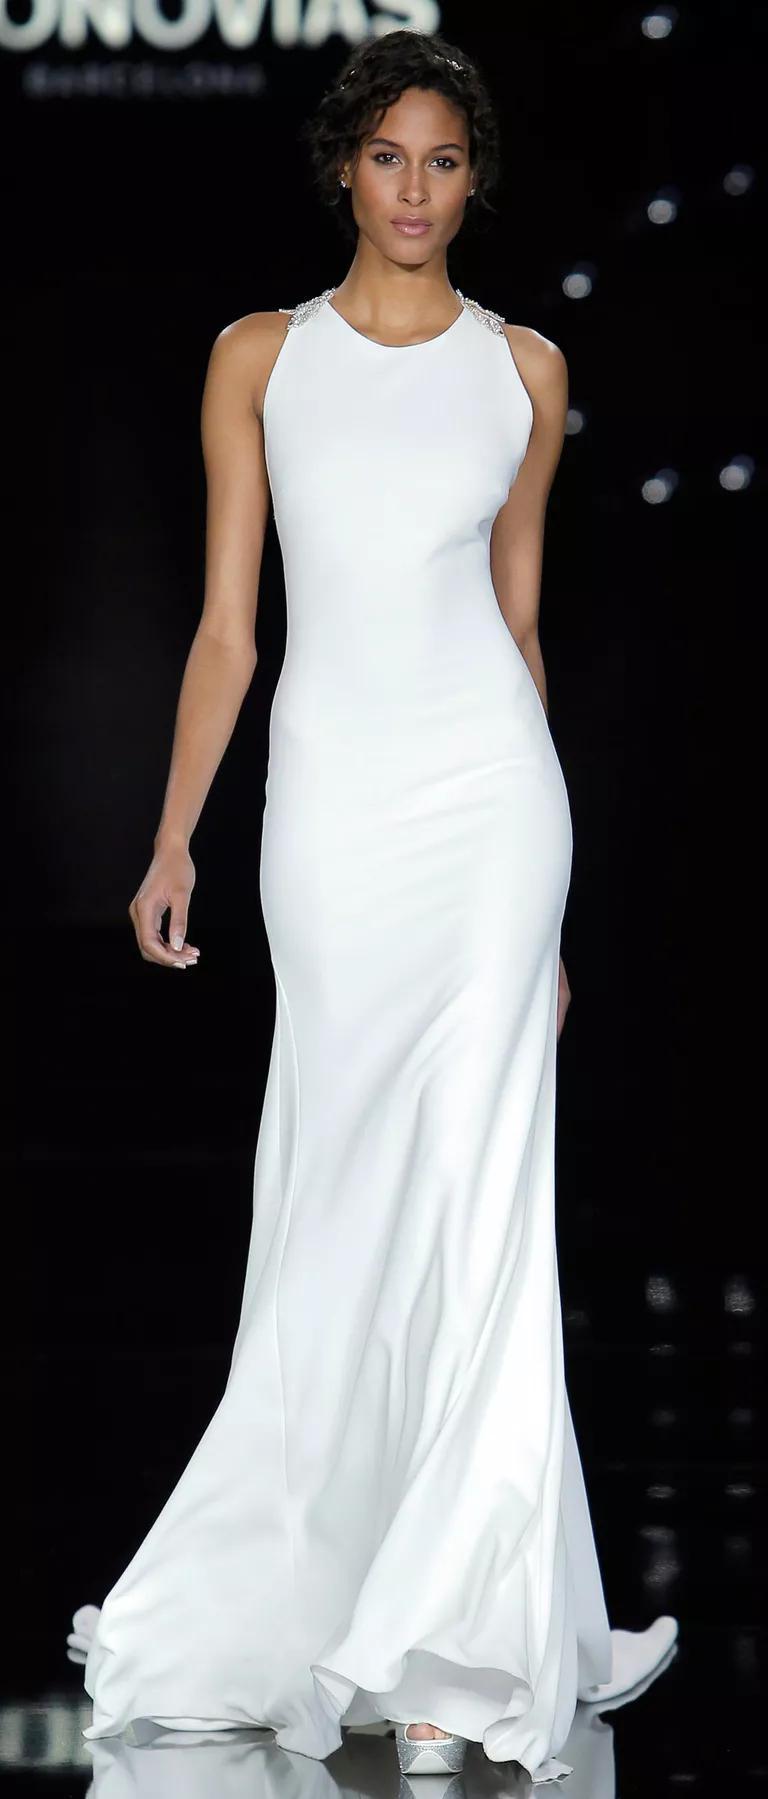 slinky sheath wedding dress courthouse wedding dresses Wedding Dresses Perfect For An Elopement